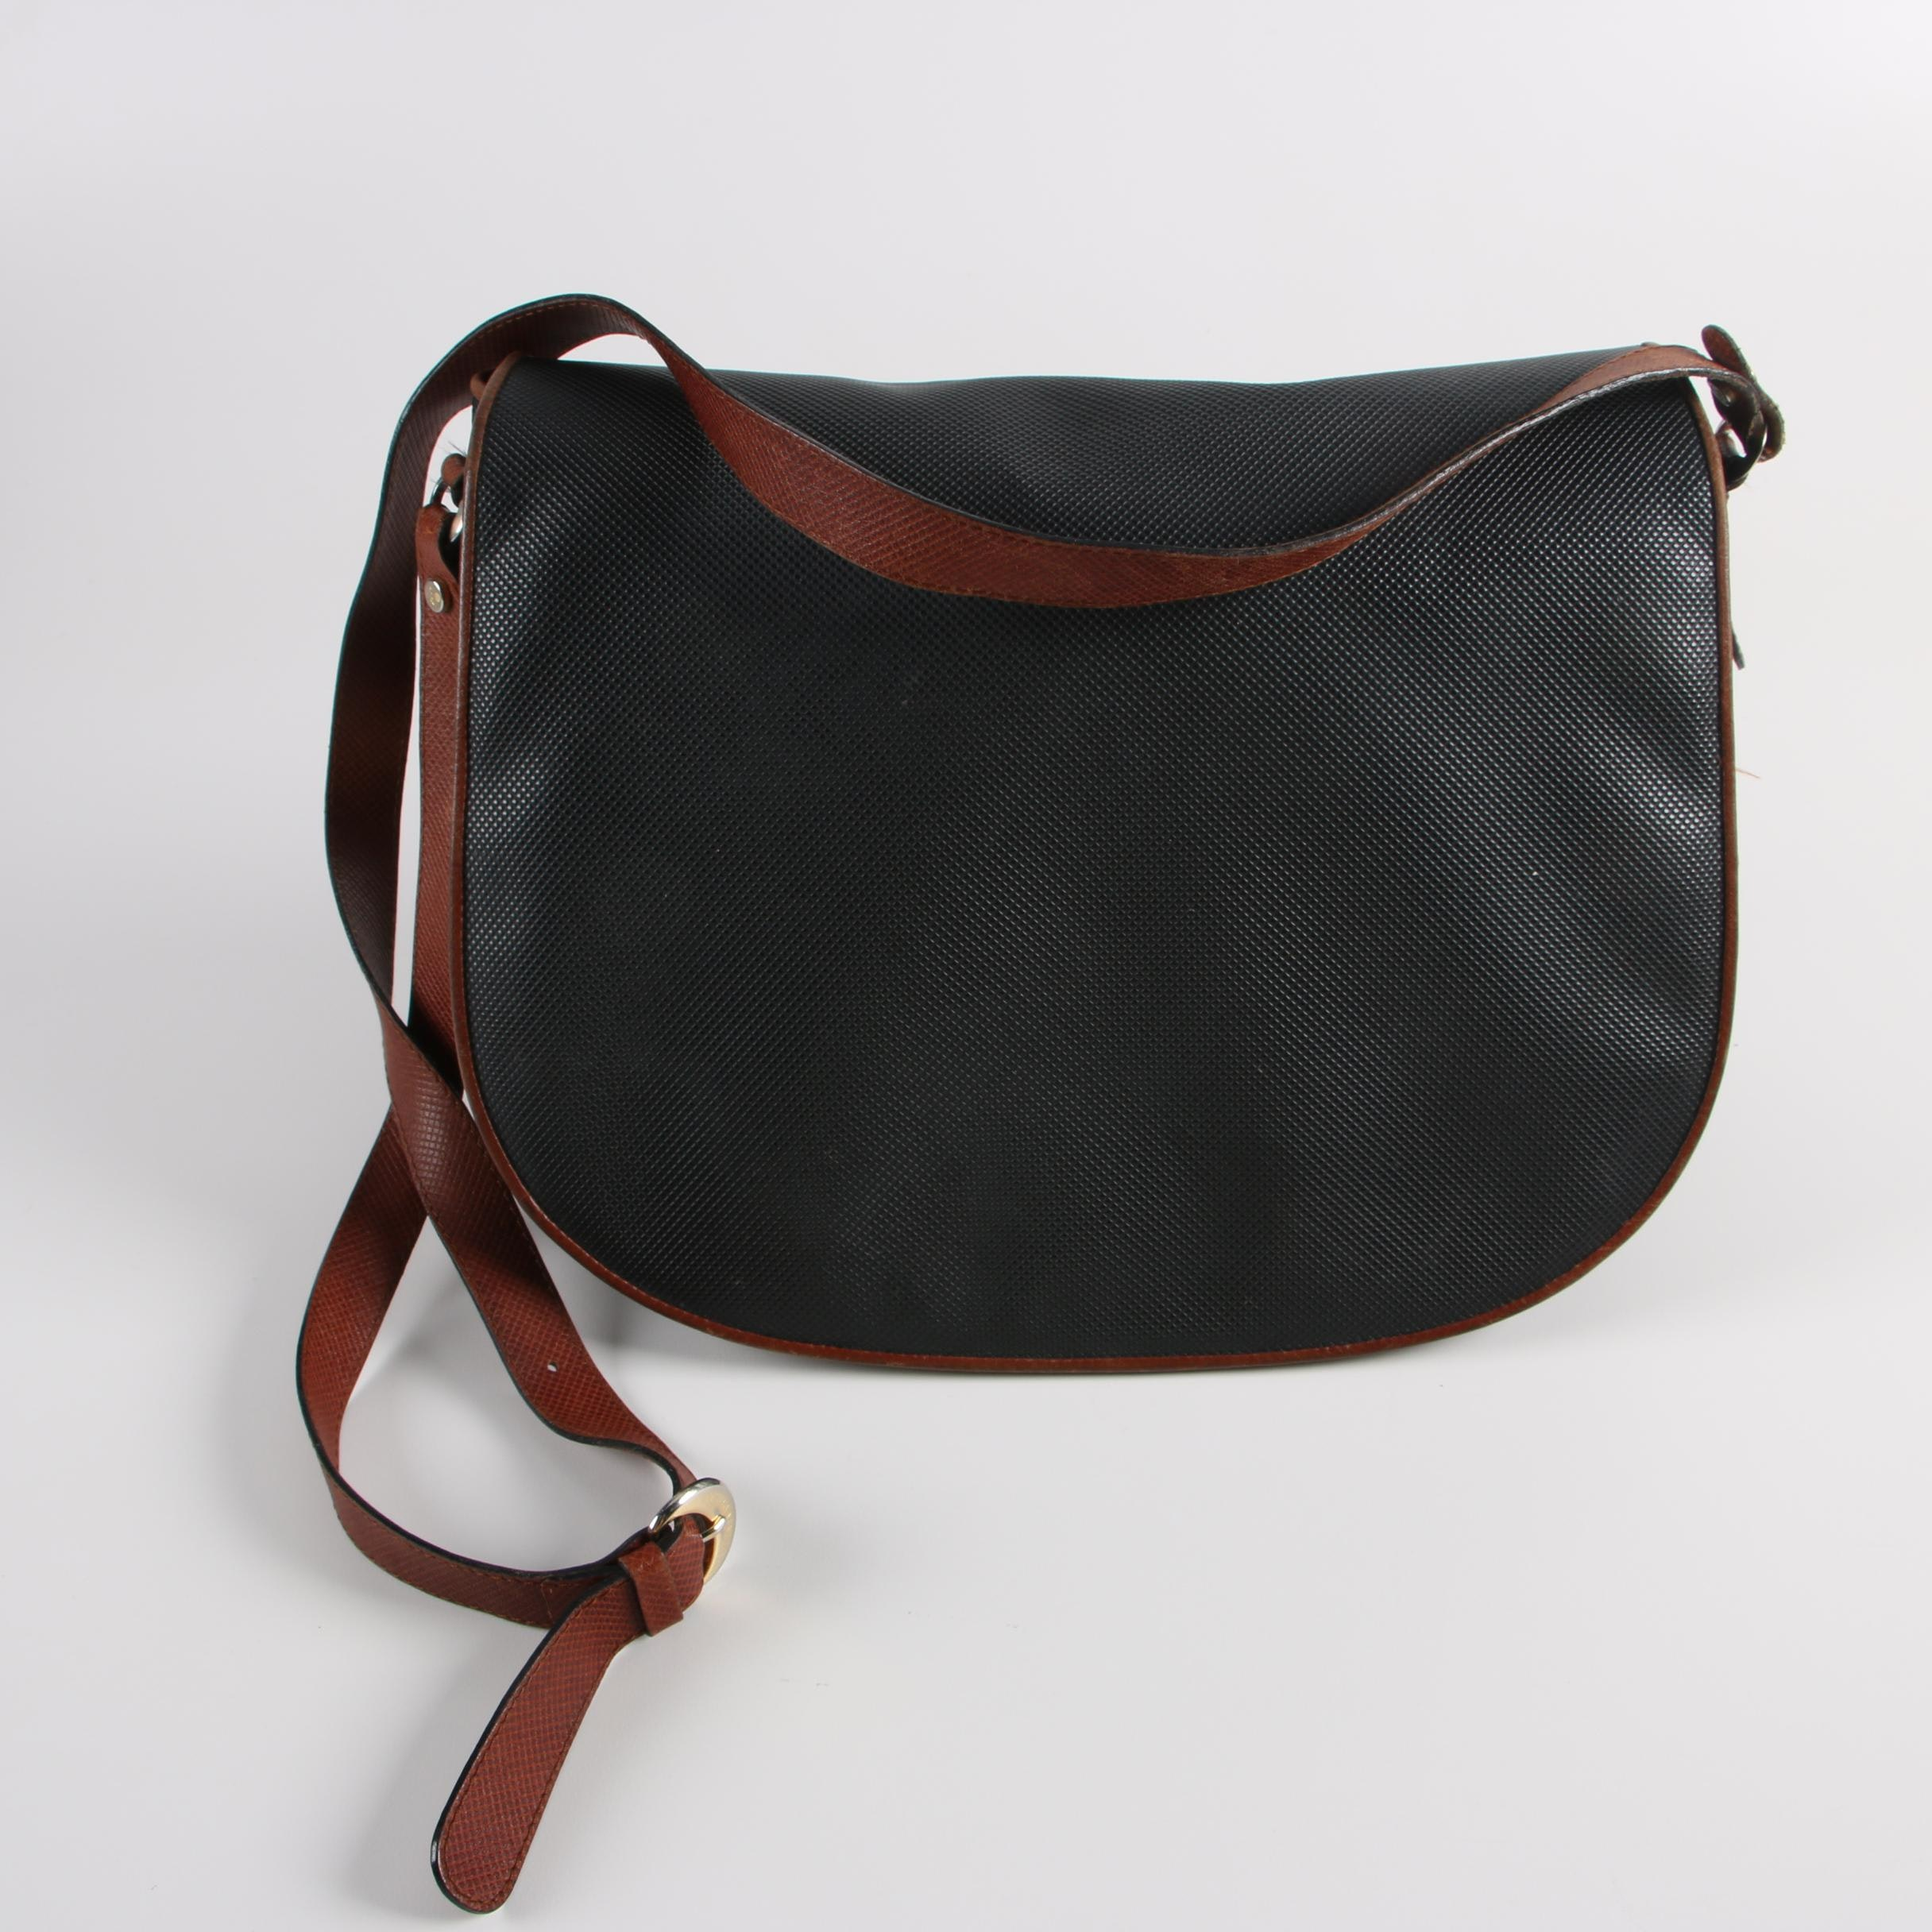 Bottega Veneta Black Coated Canvas Flap Shoulder Bag